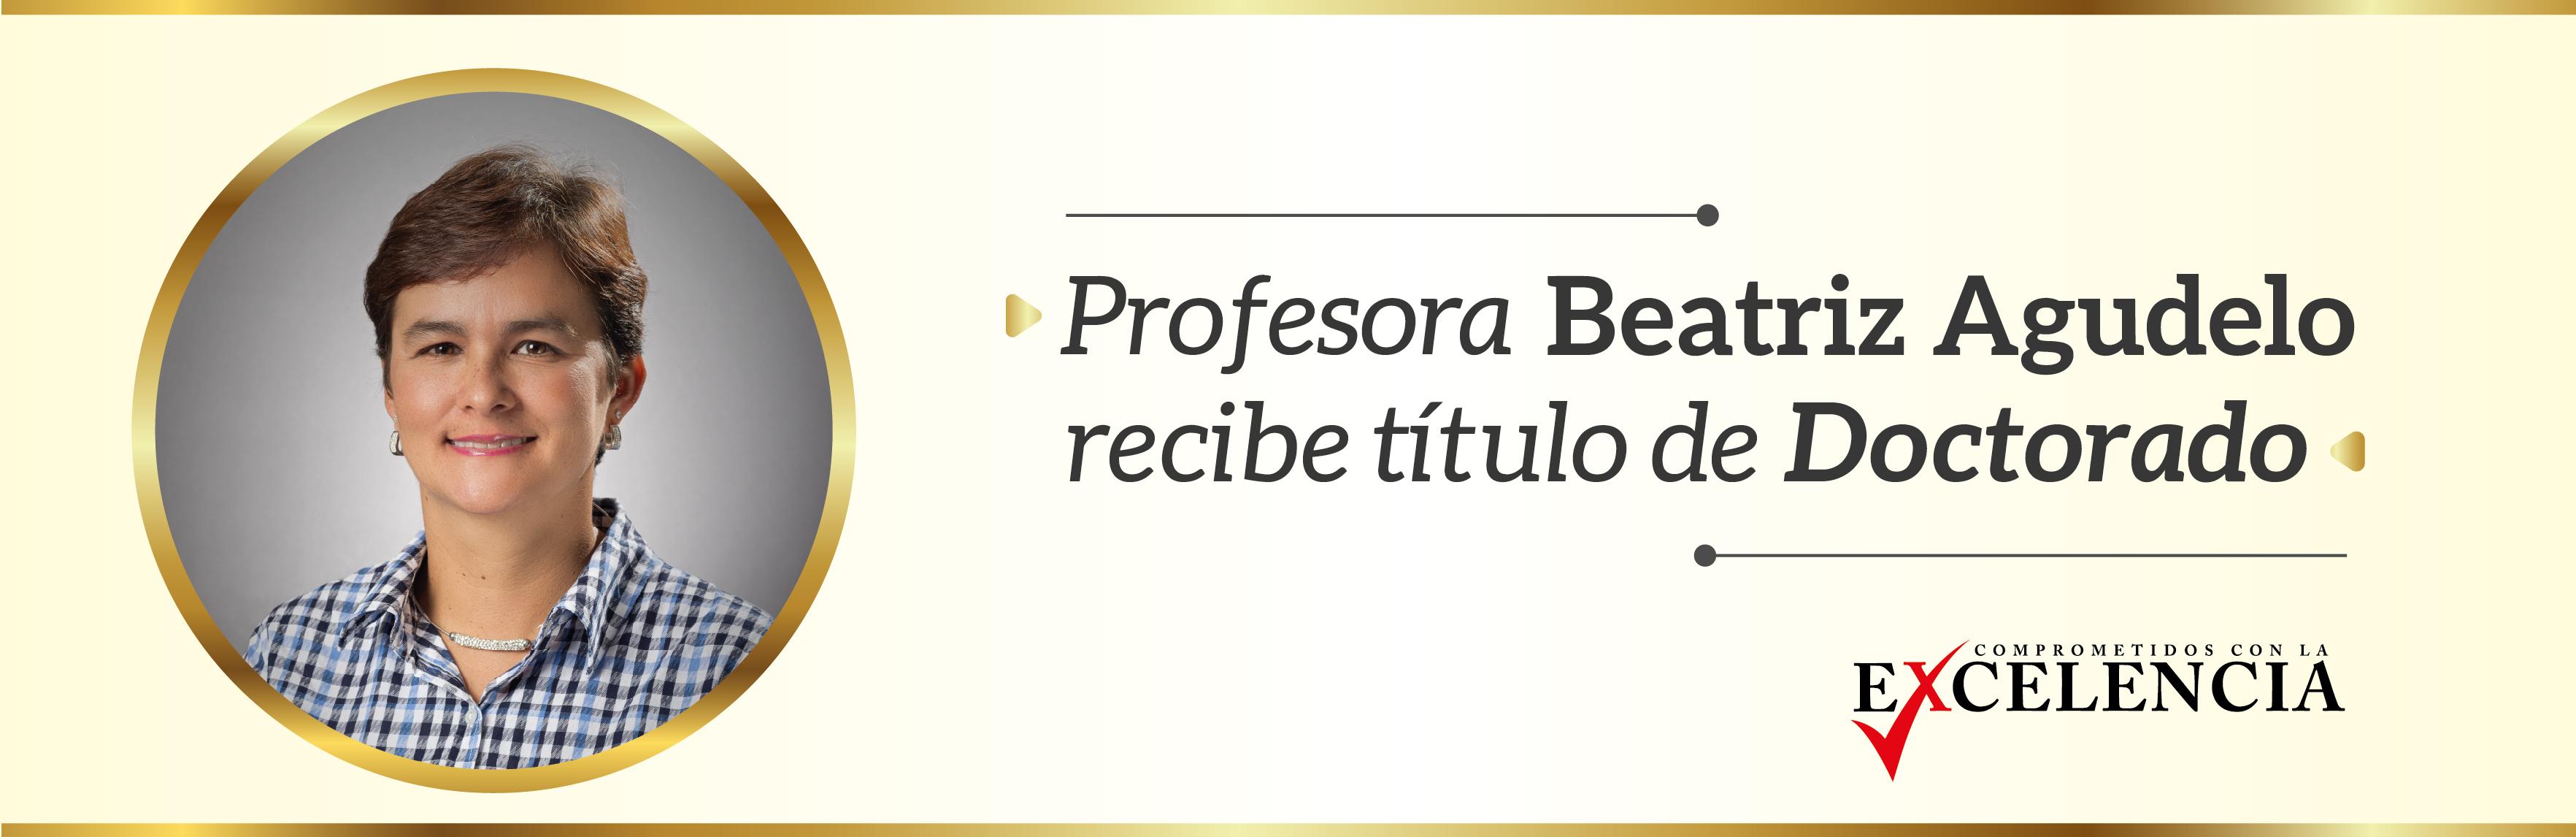 http://fayol.univalle.edu.co/bannerhtml5/boletin167-01.jpg